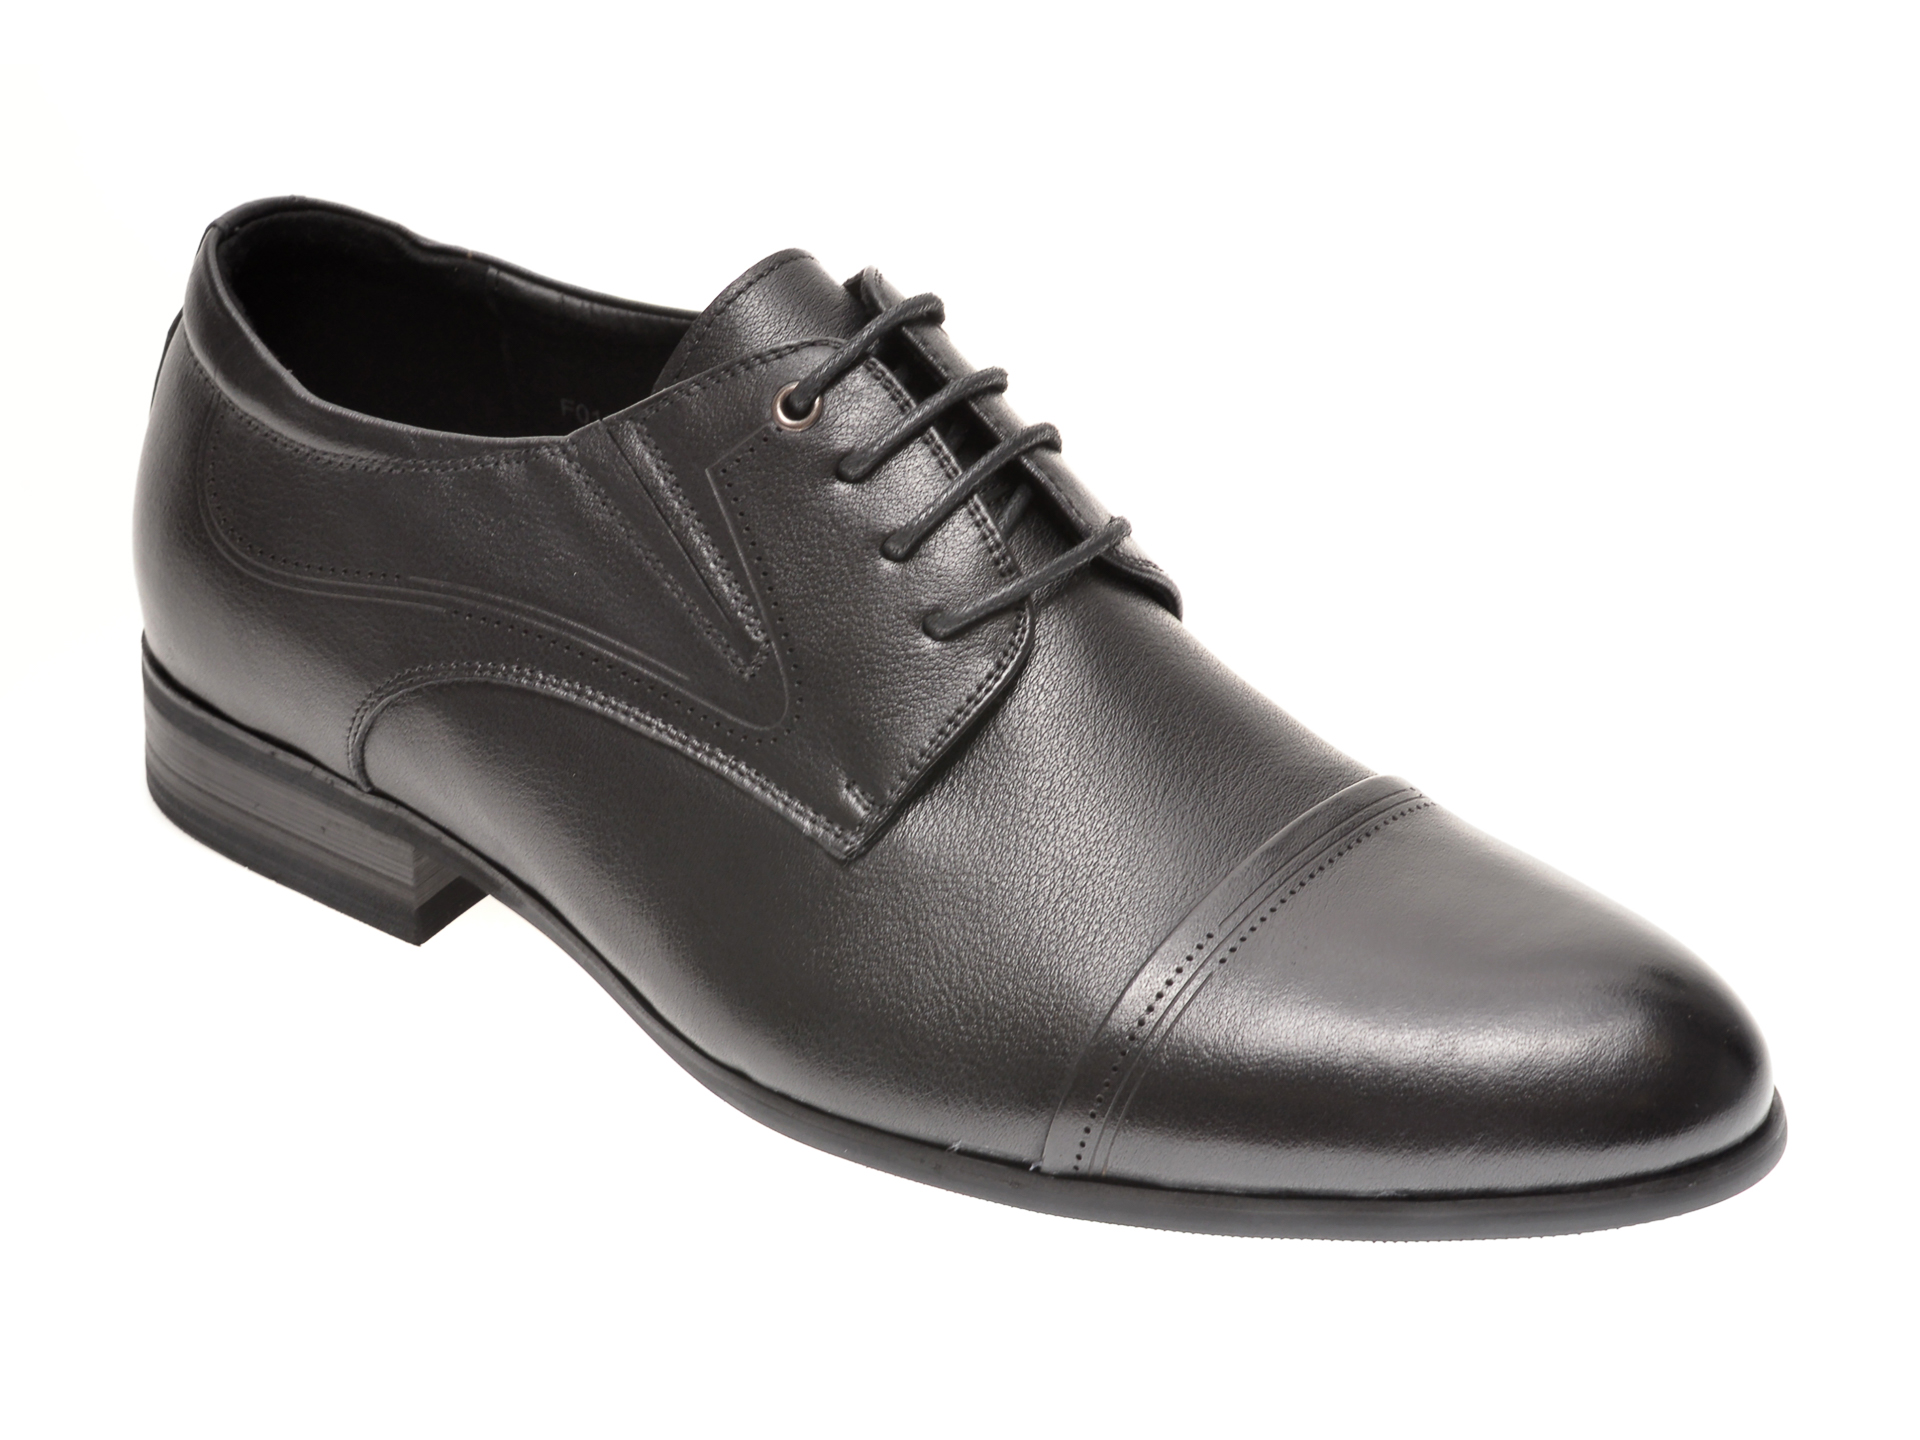 Pantofi OTTER negri, F01891, din piele naturala imagine